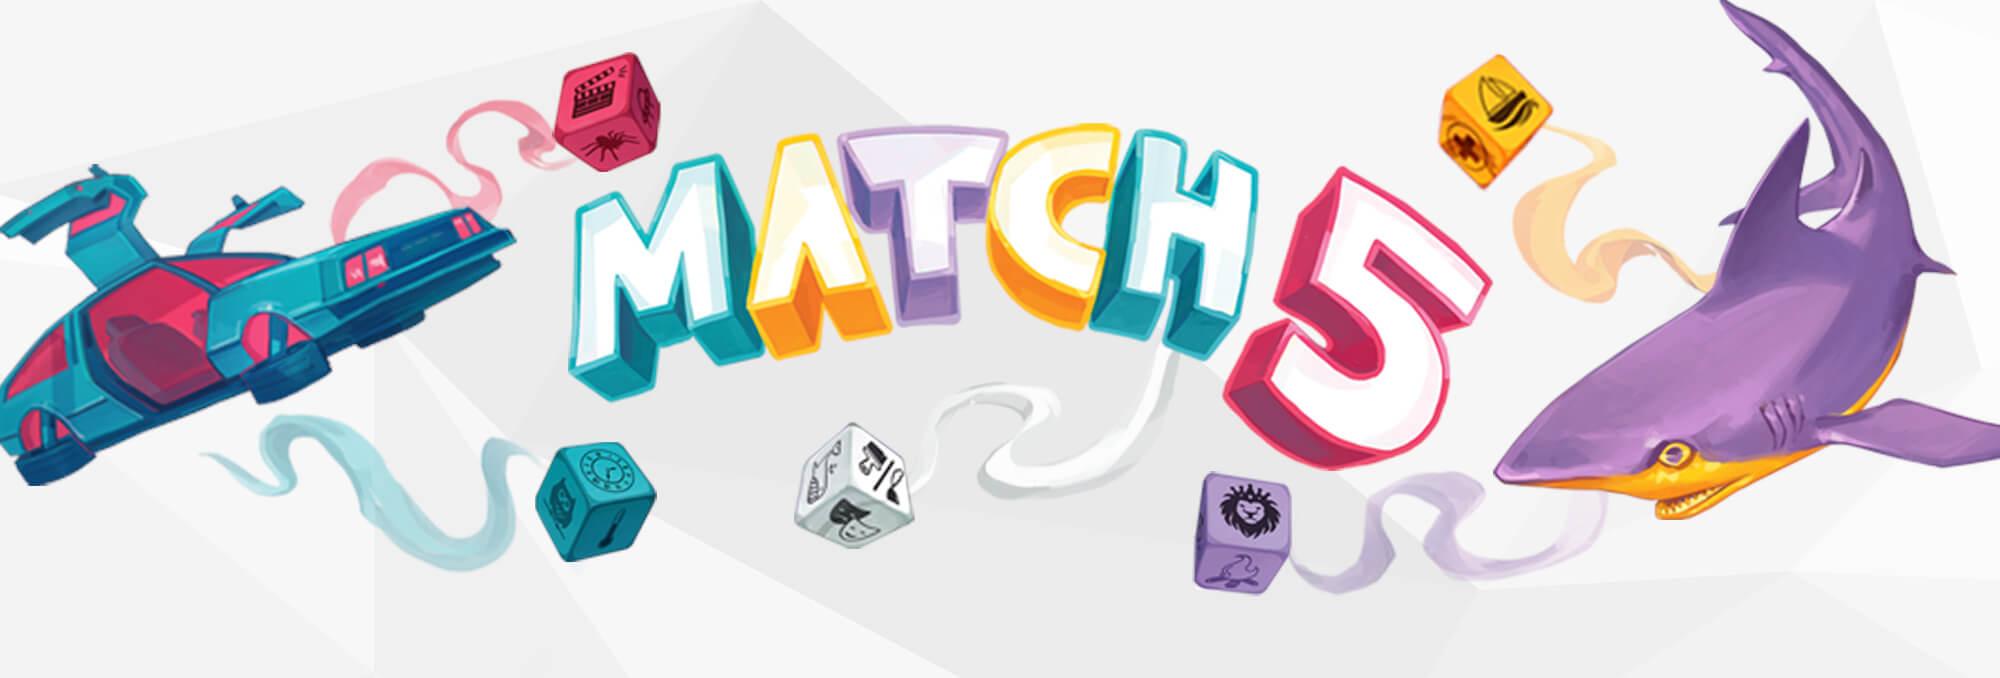 Slide-Match5-3